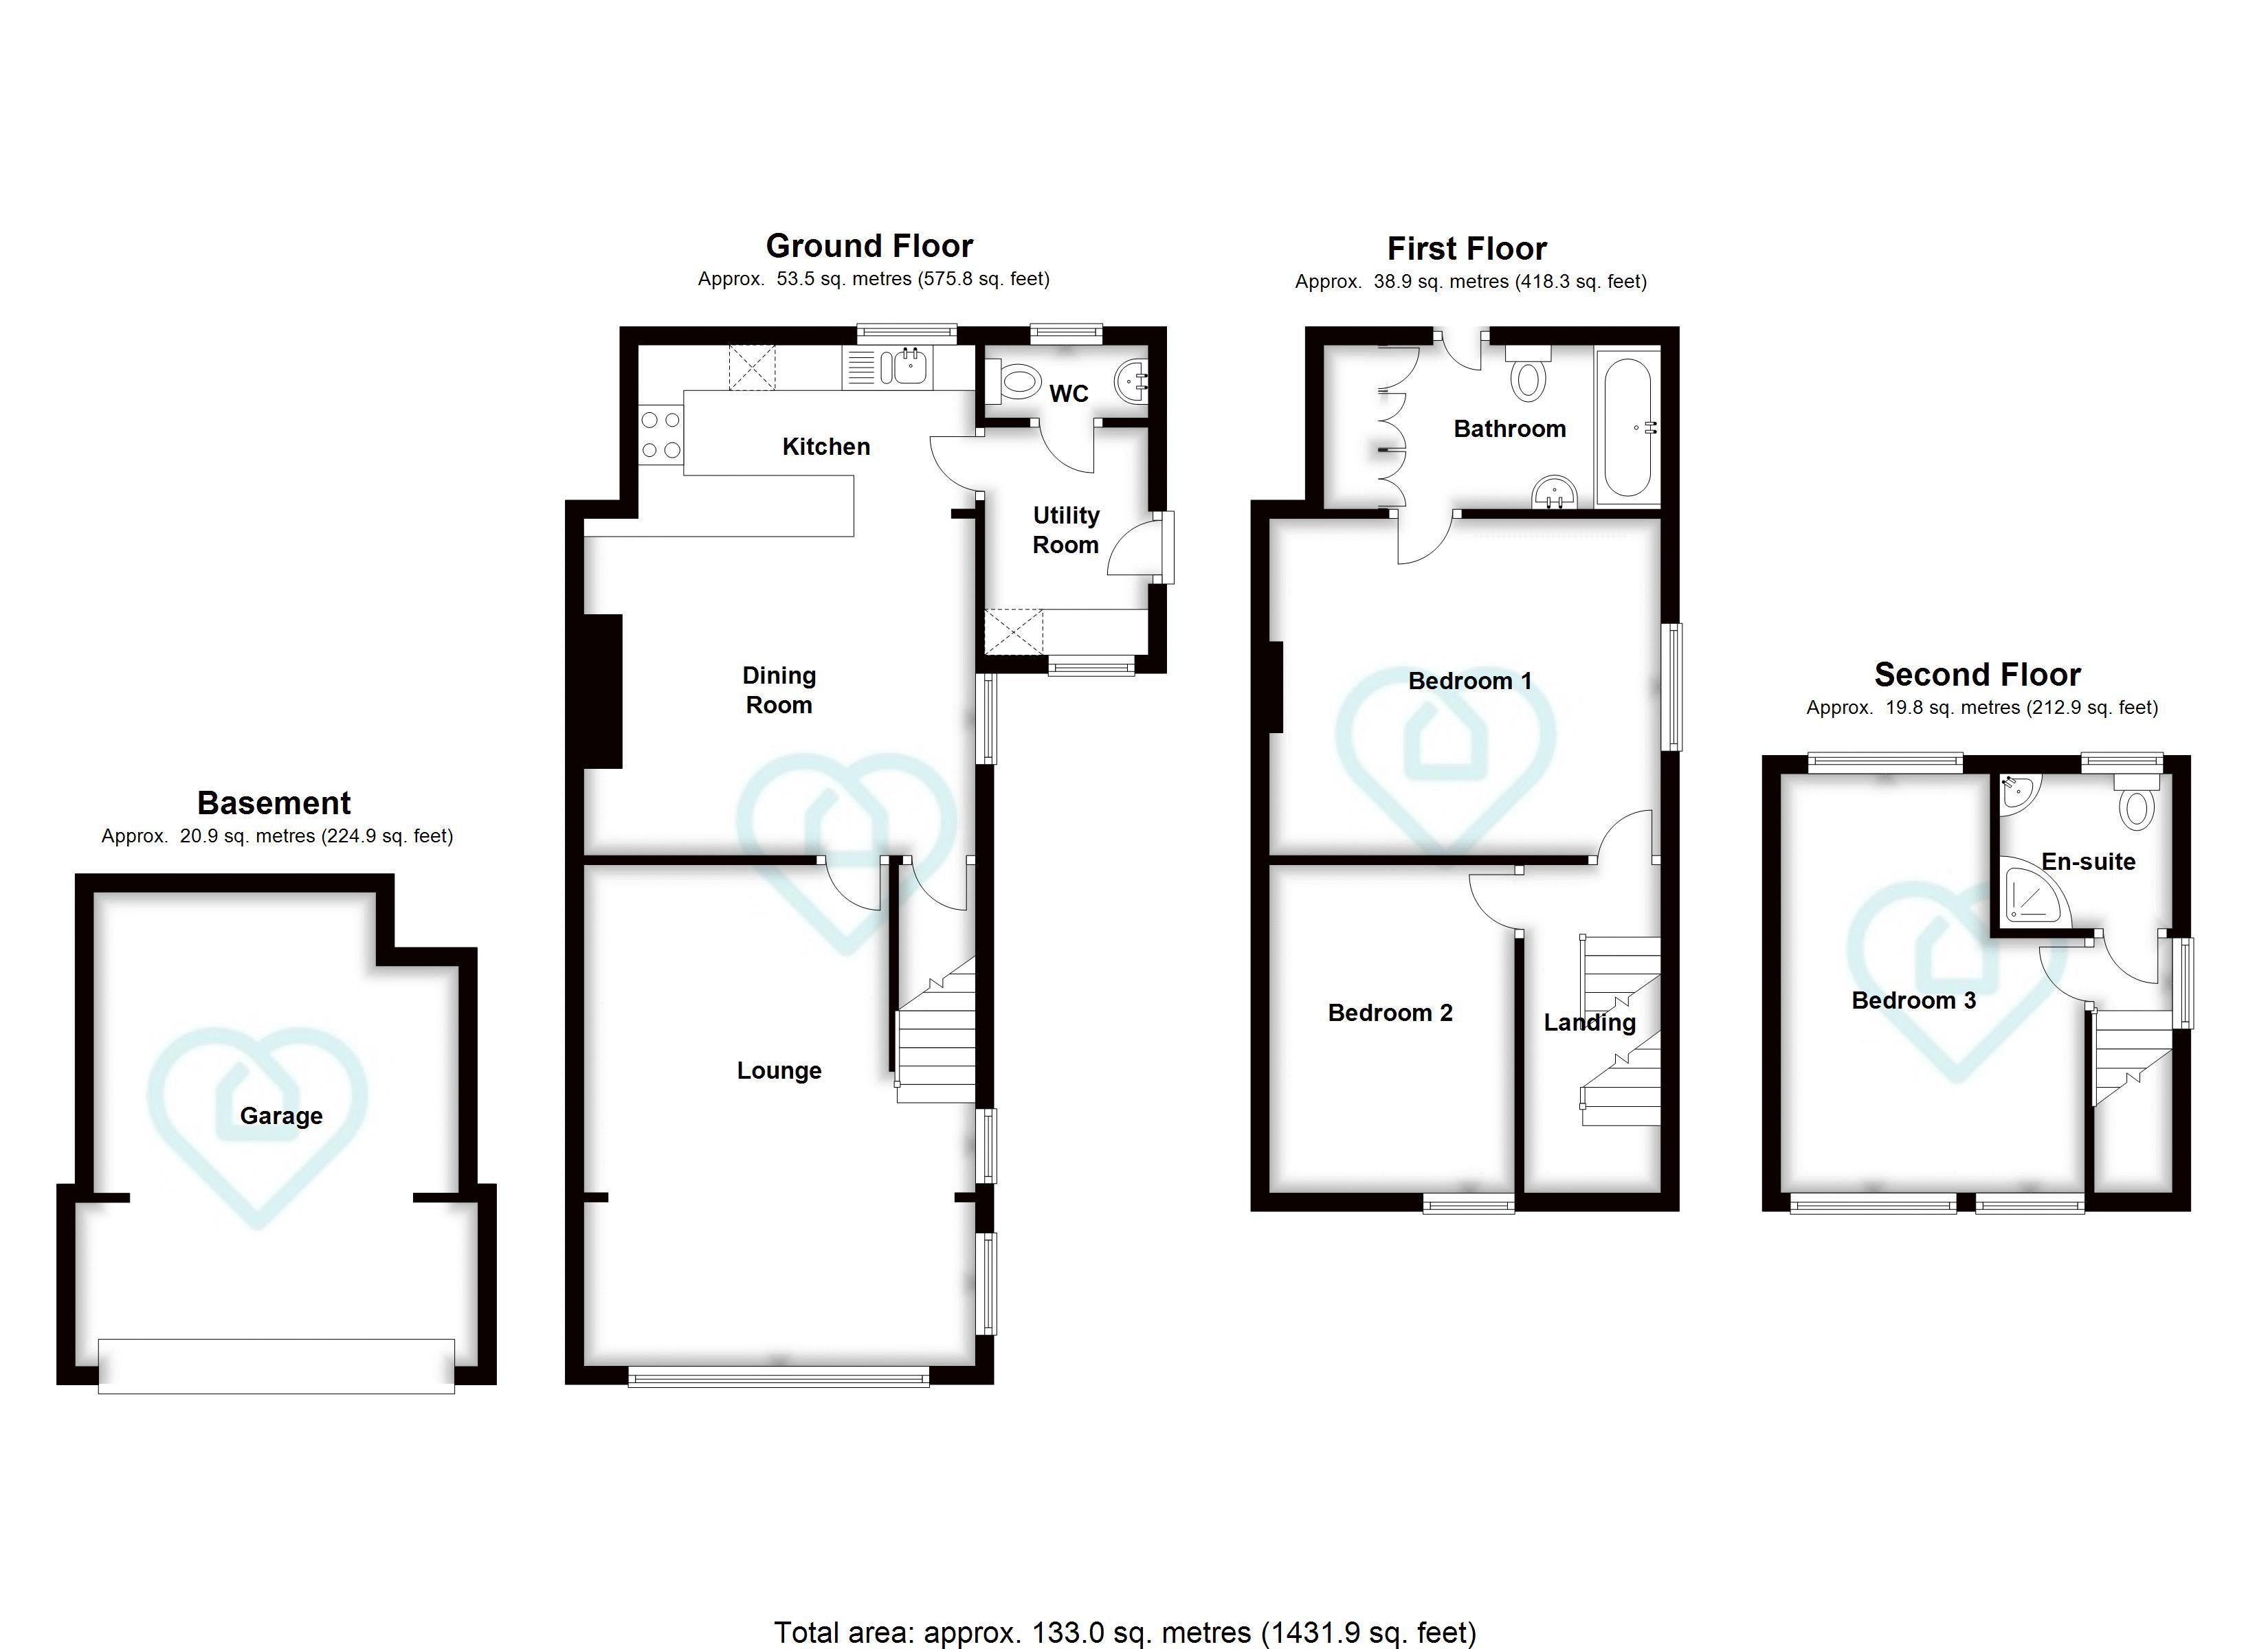 house plan ipad app plan free download home plans ideas